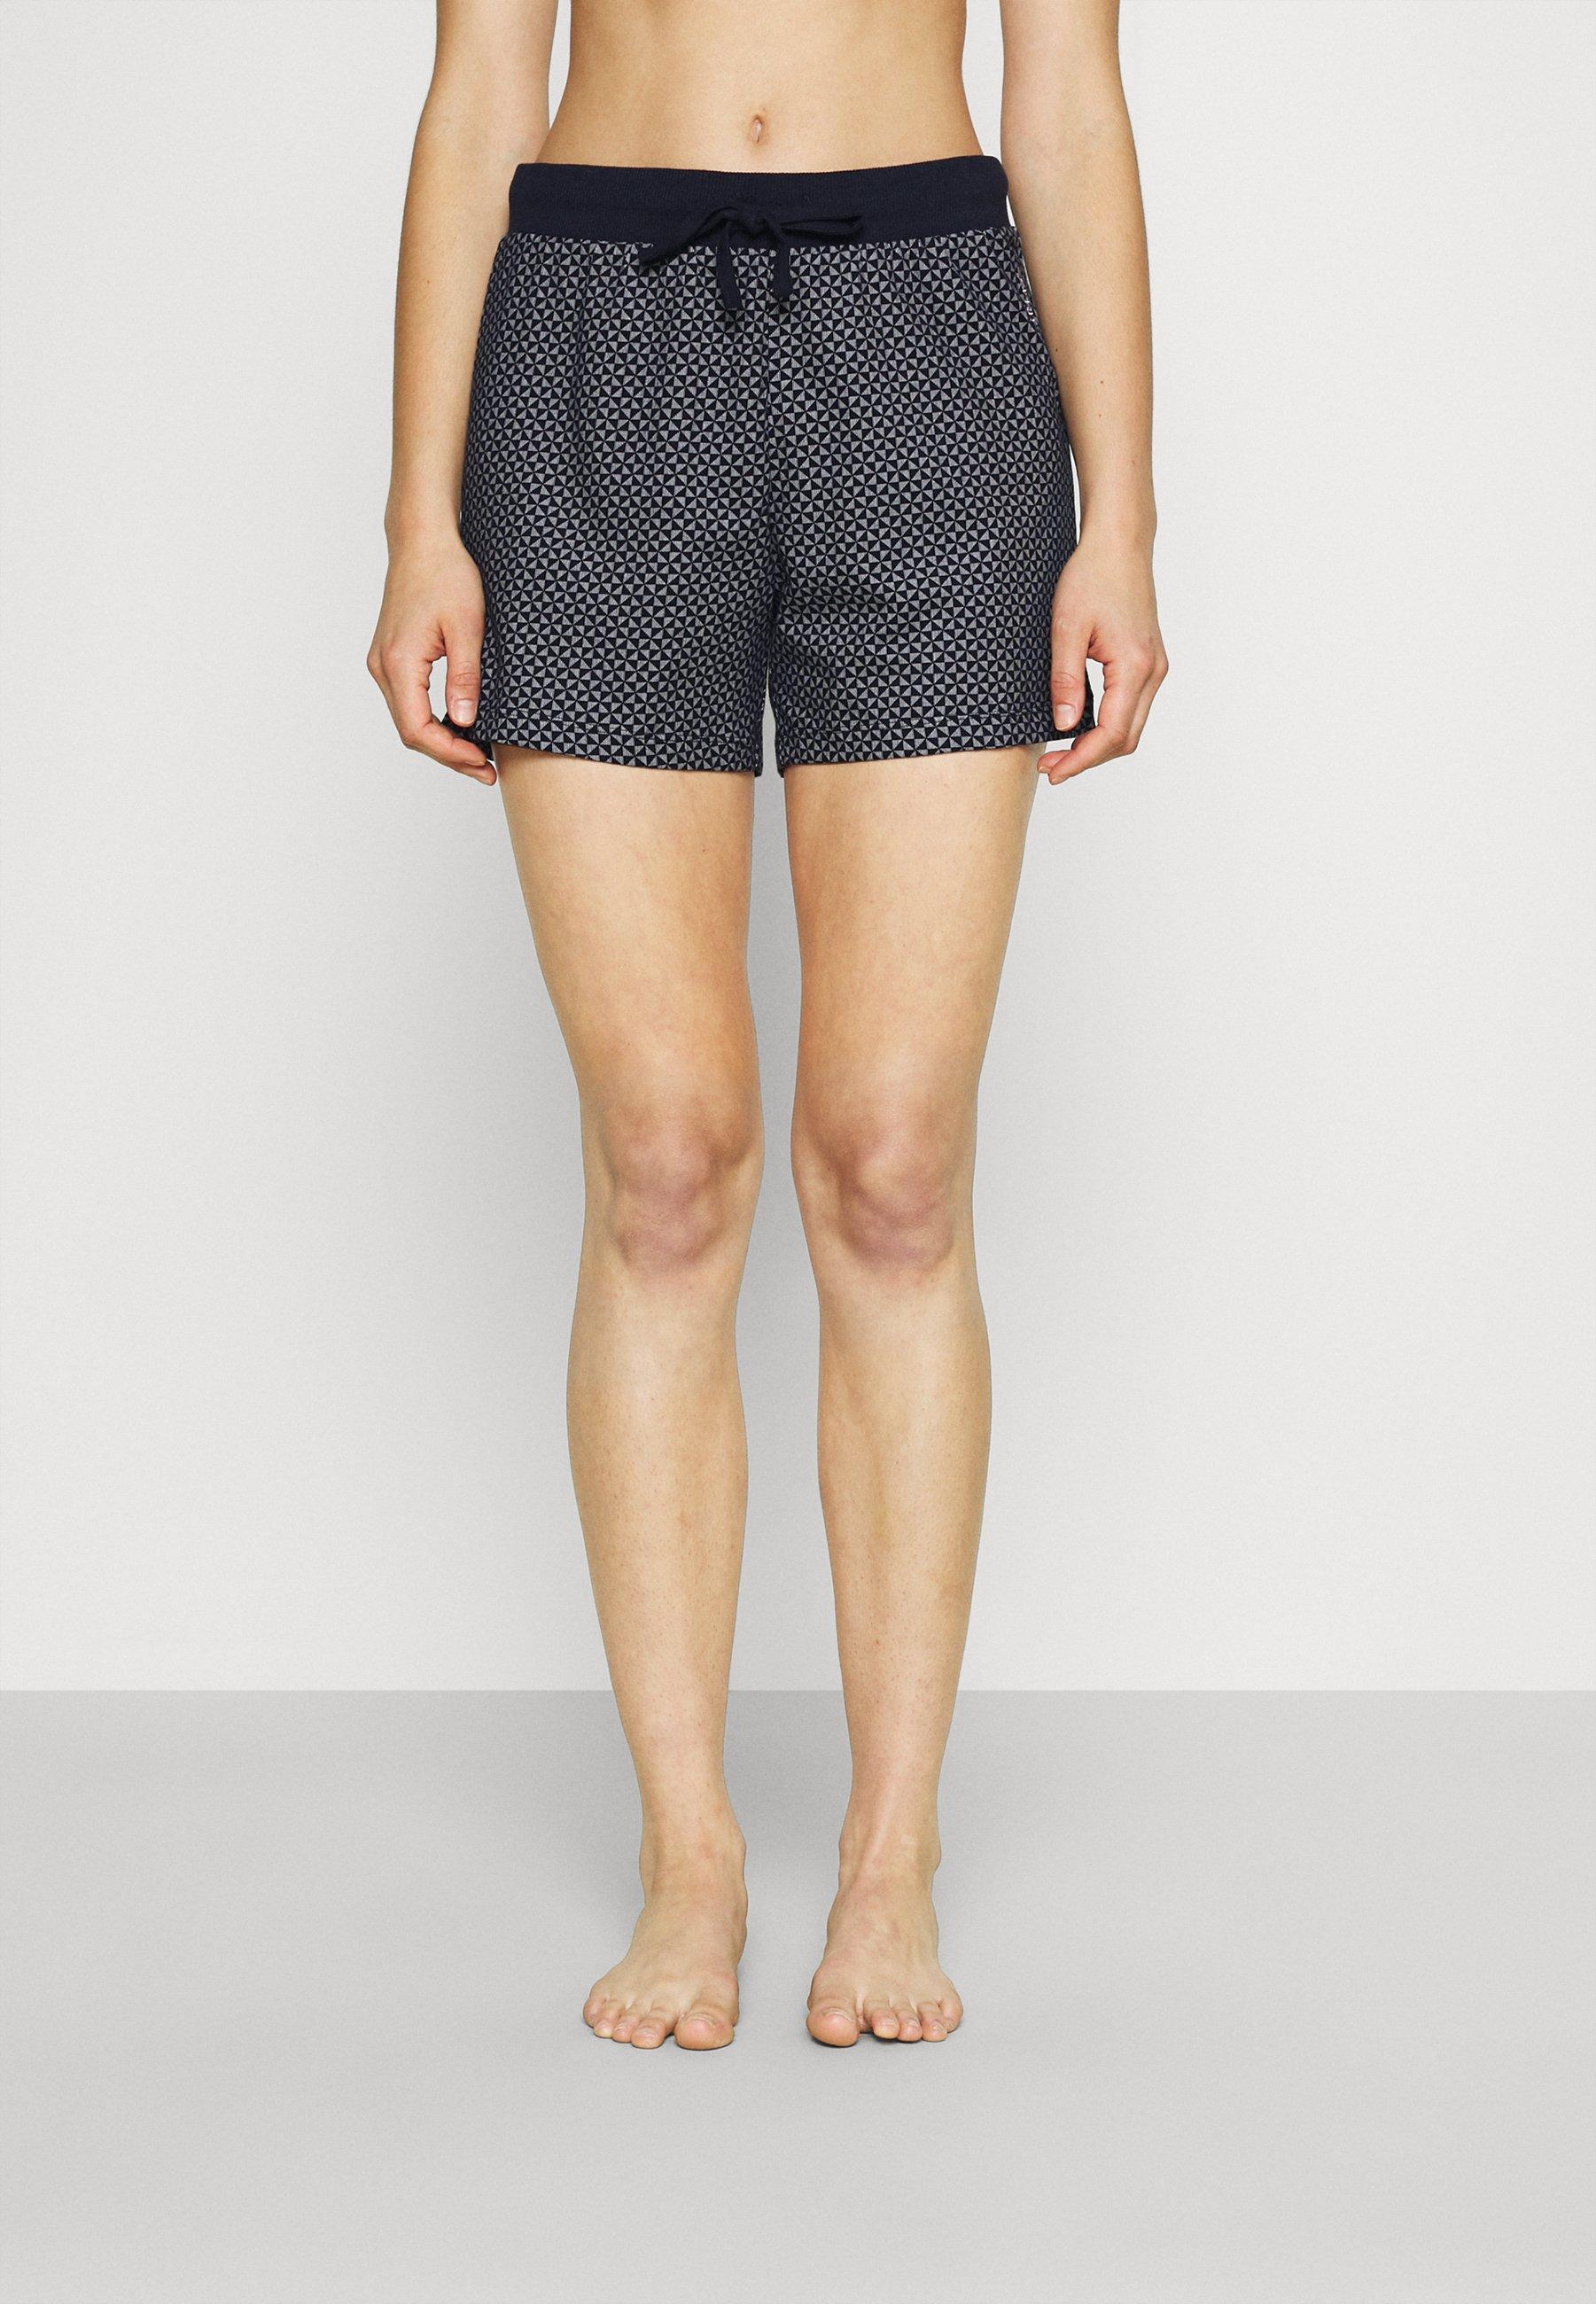 Donna EVERYDAY SINGLE SHORTS - Pantaloni del pigiama